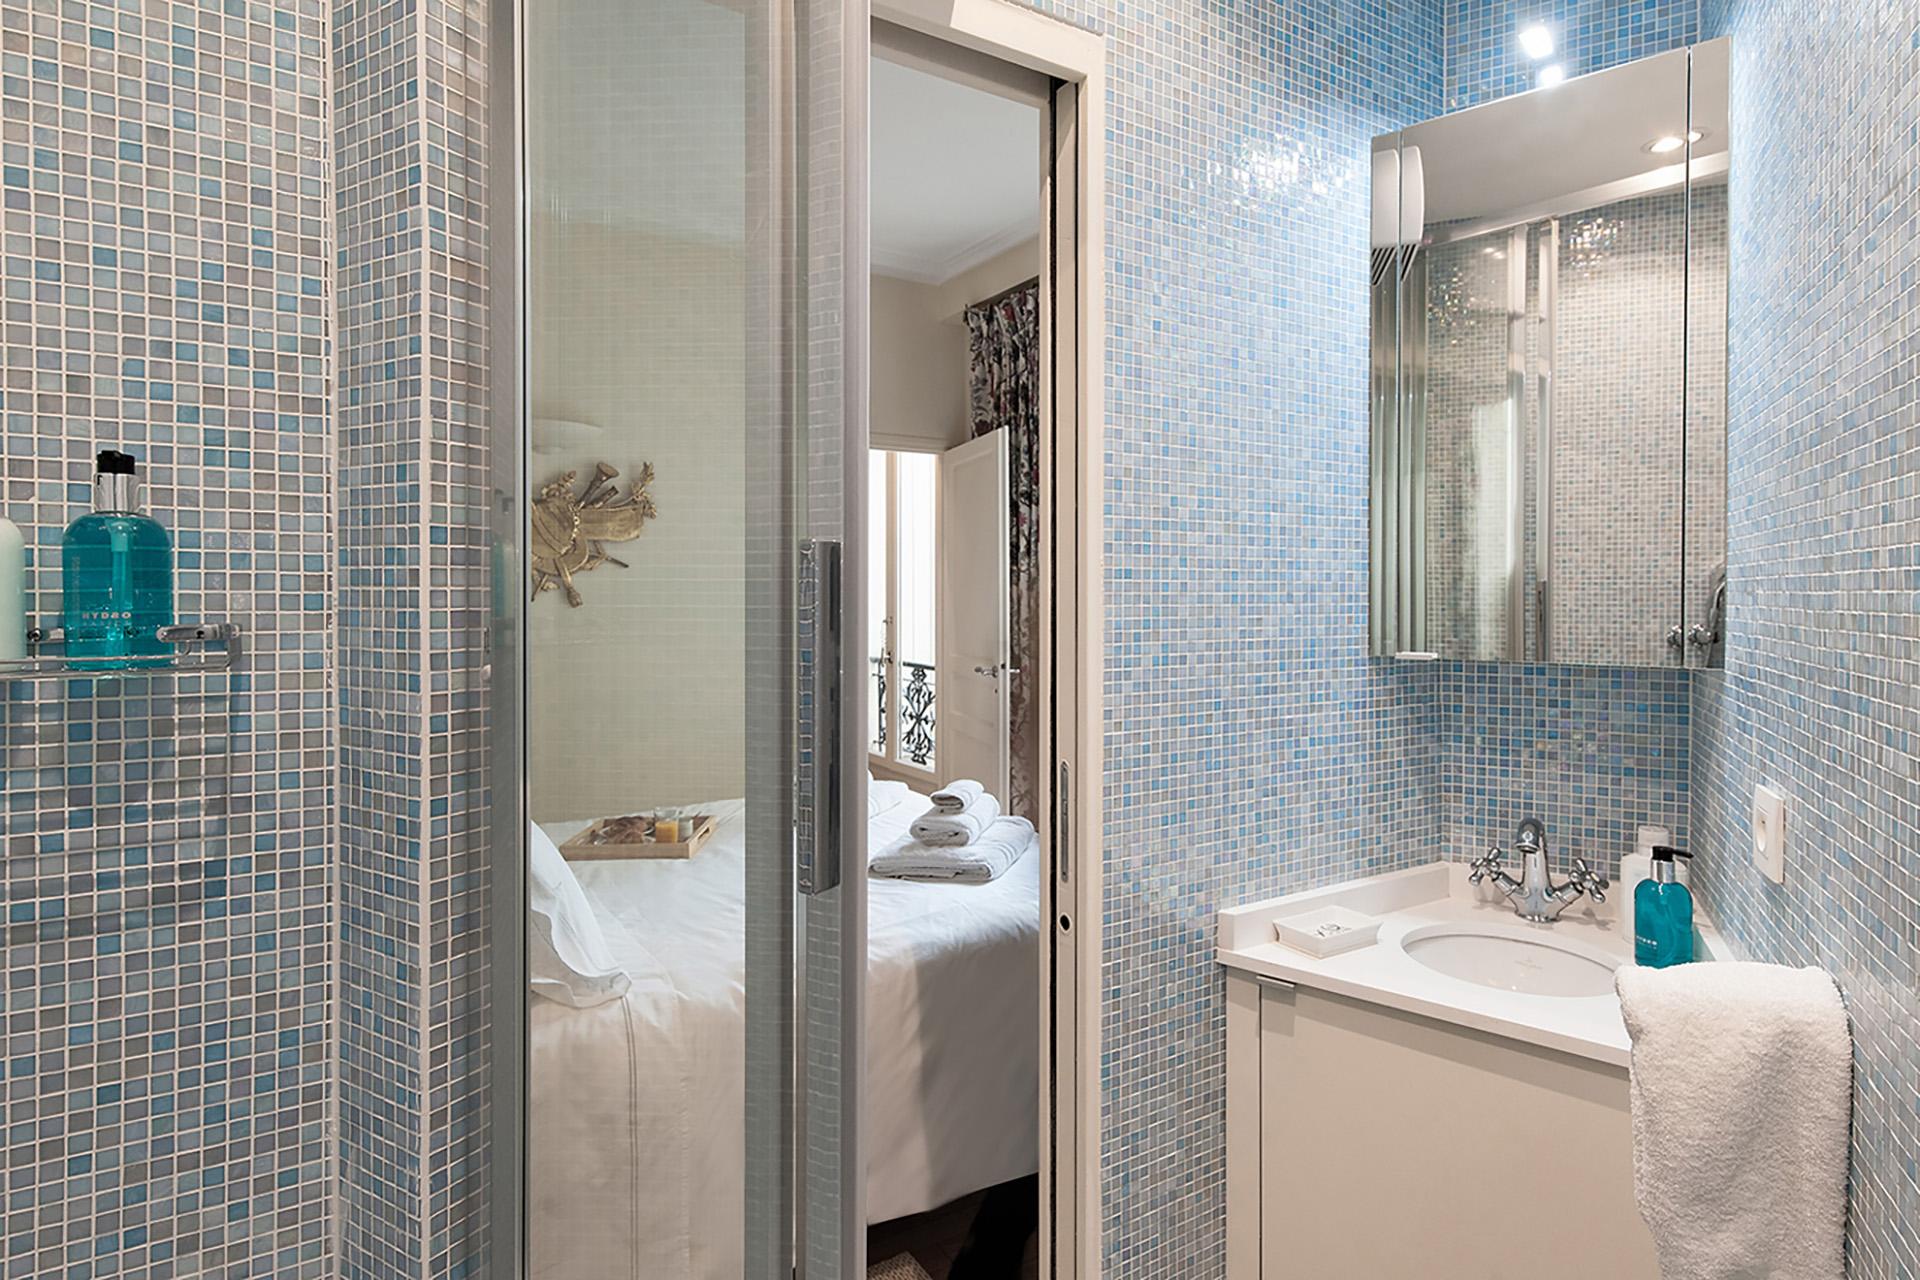 Shower in the ensuite bathroom.